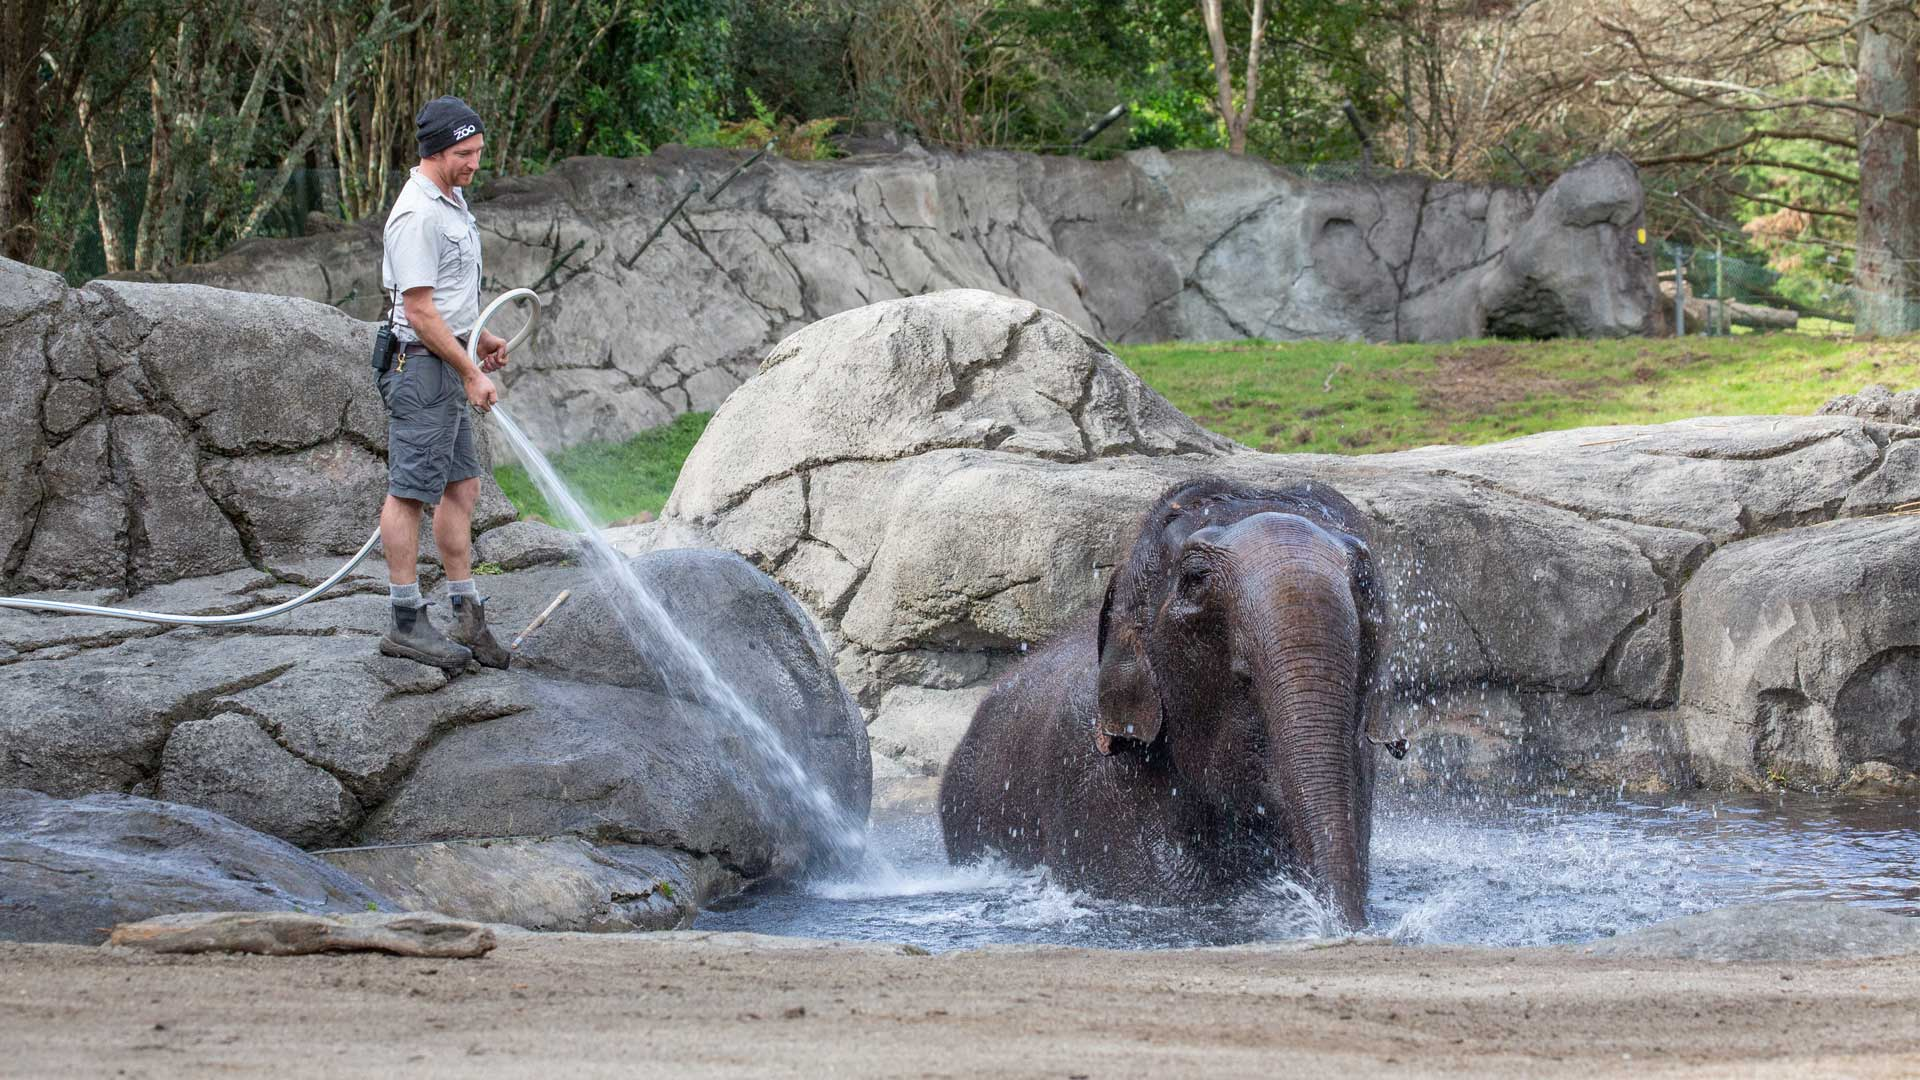 https://rfacdn.nz/zoo/assets/media/elephant-water-gallery-1.jpg